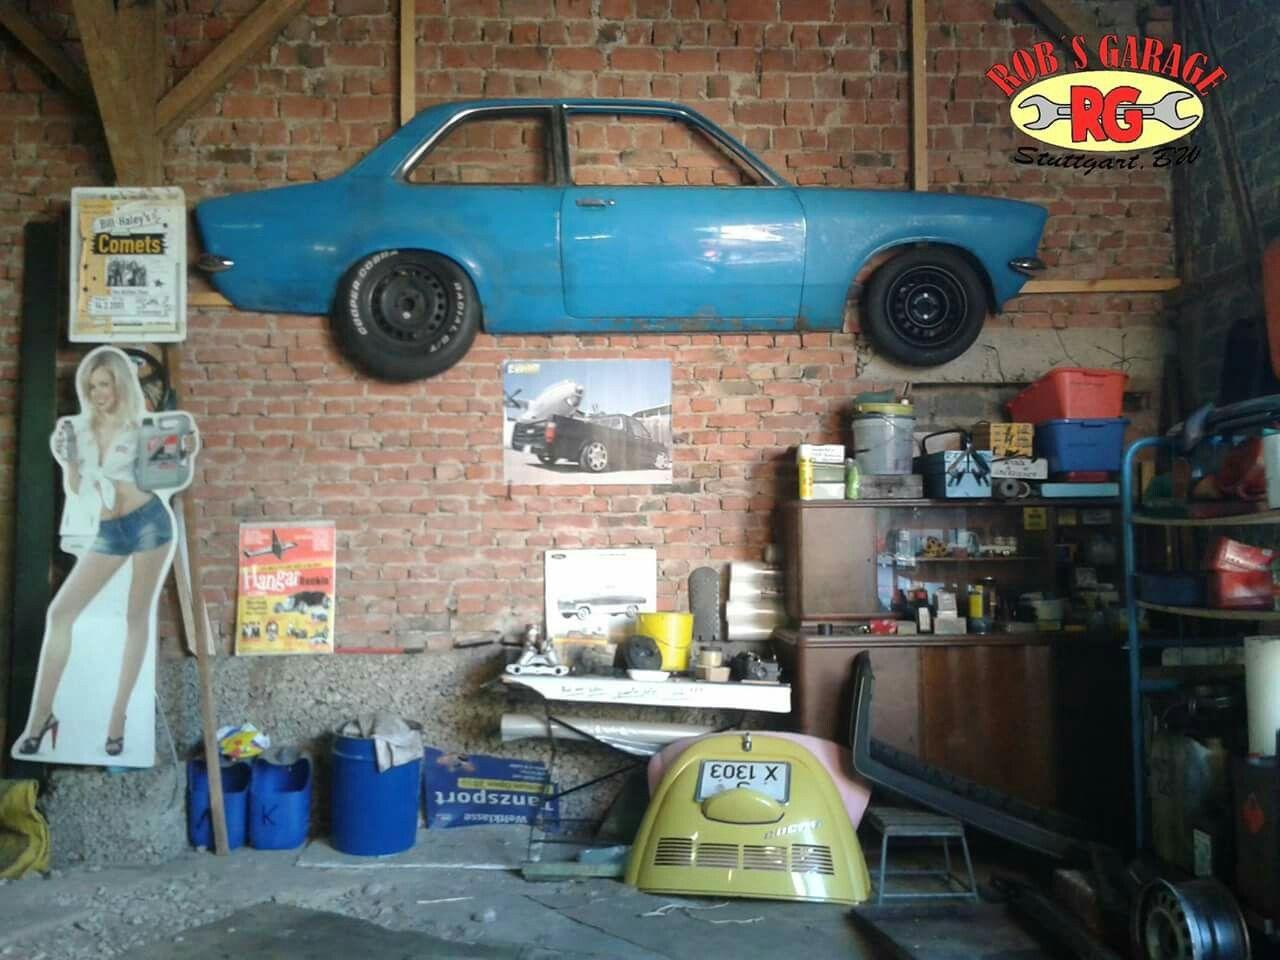 Lkw Garage Dekoration : Garage kadett käfer schrauber oldtimer oldschool rockabilly hot